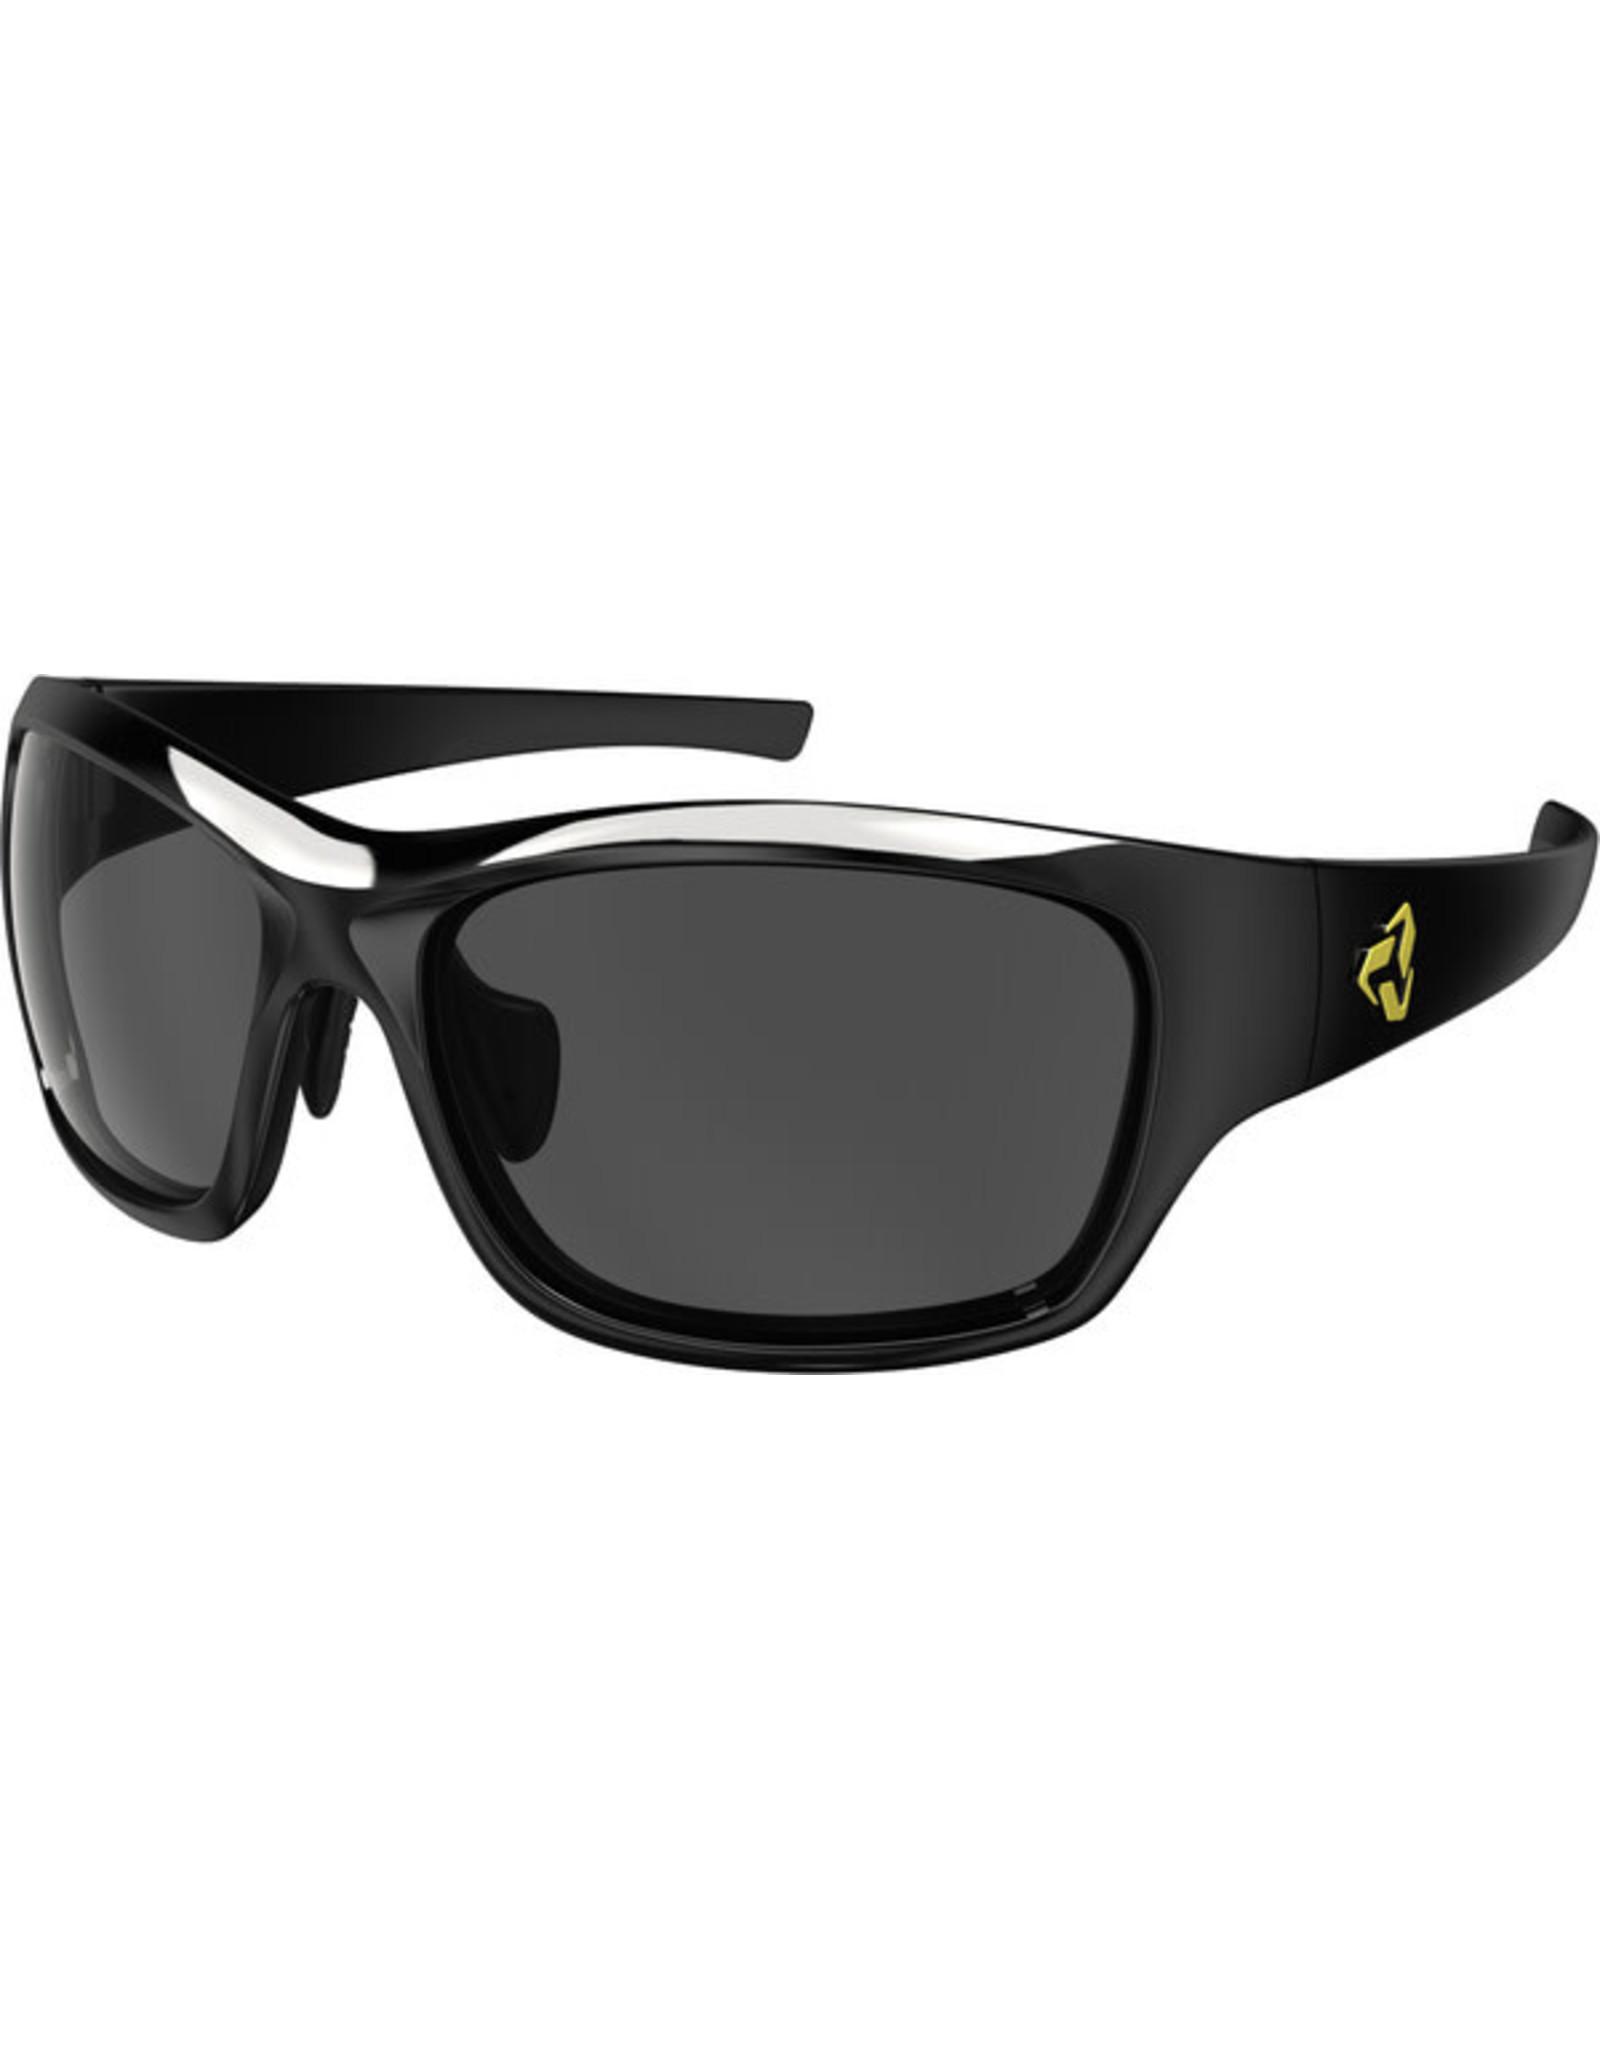 Ryders Eyewear Ryders Khyber Core Lens S19